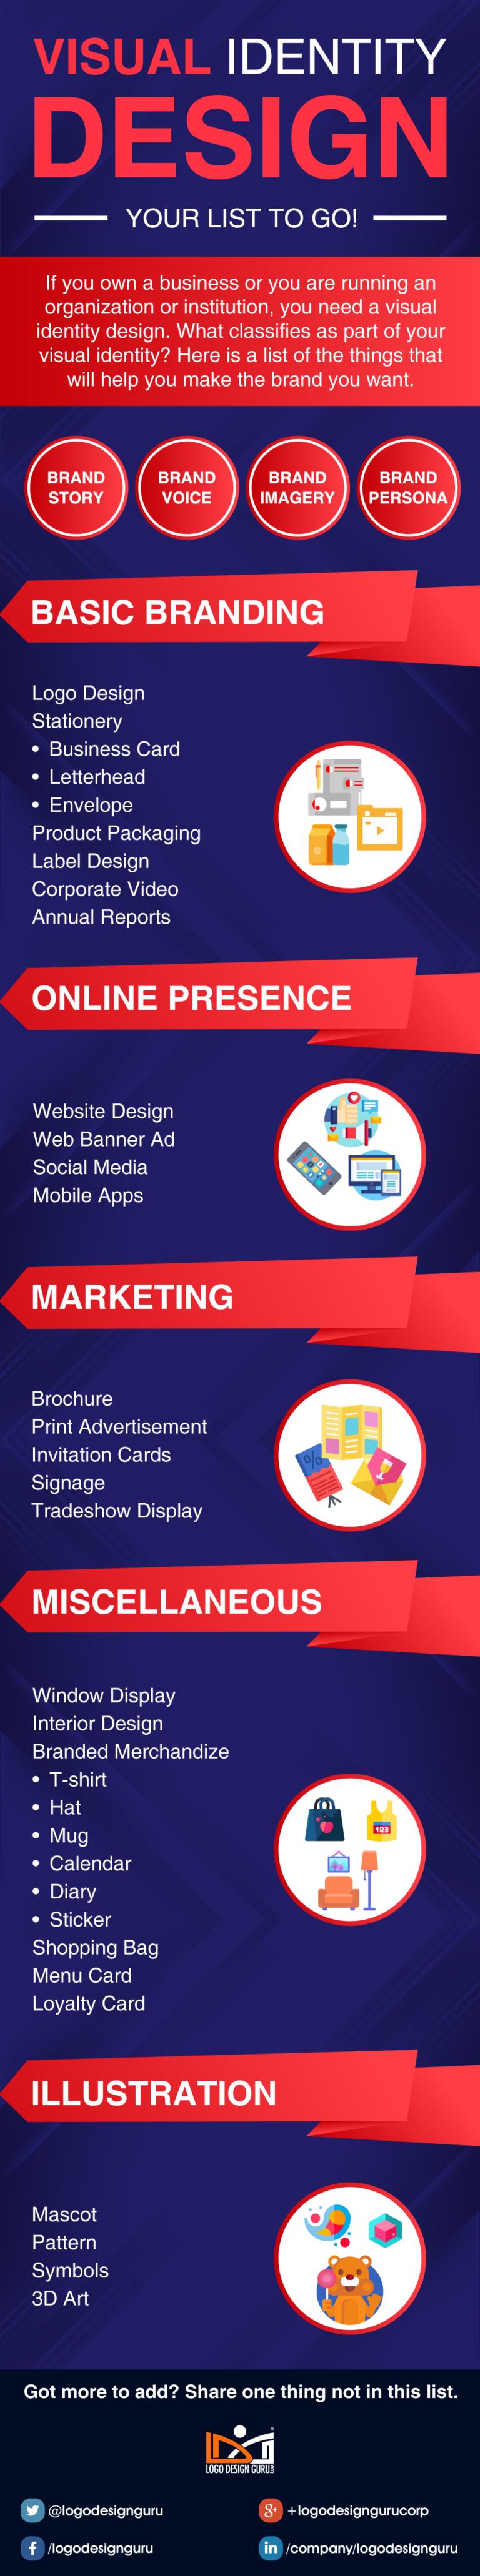 "Branding Goals: Visual Identity Design ""Why"" #infographic"